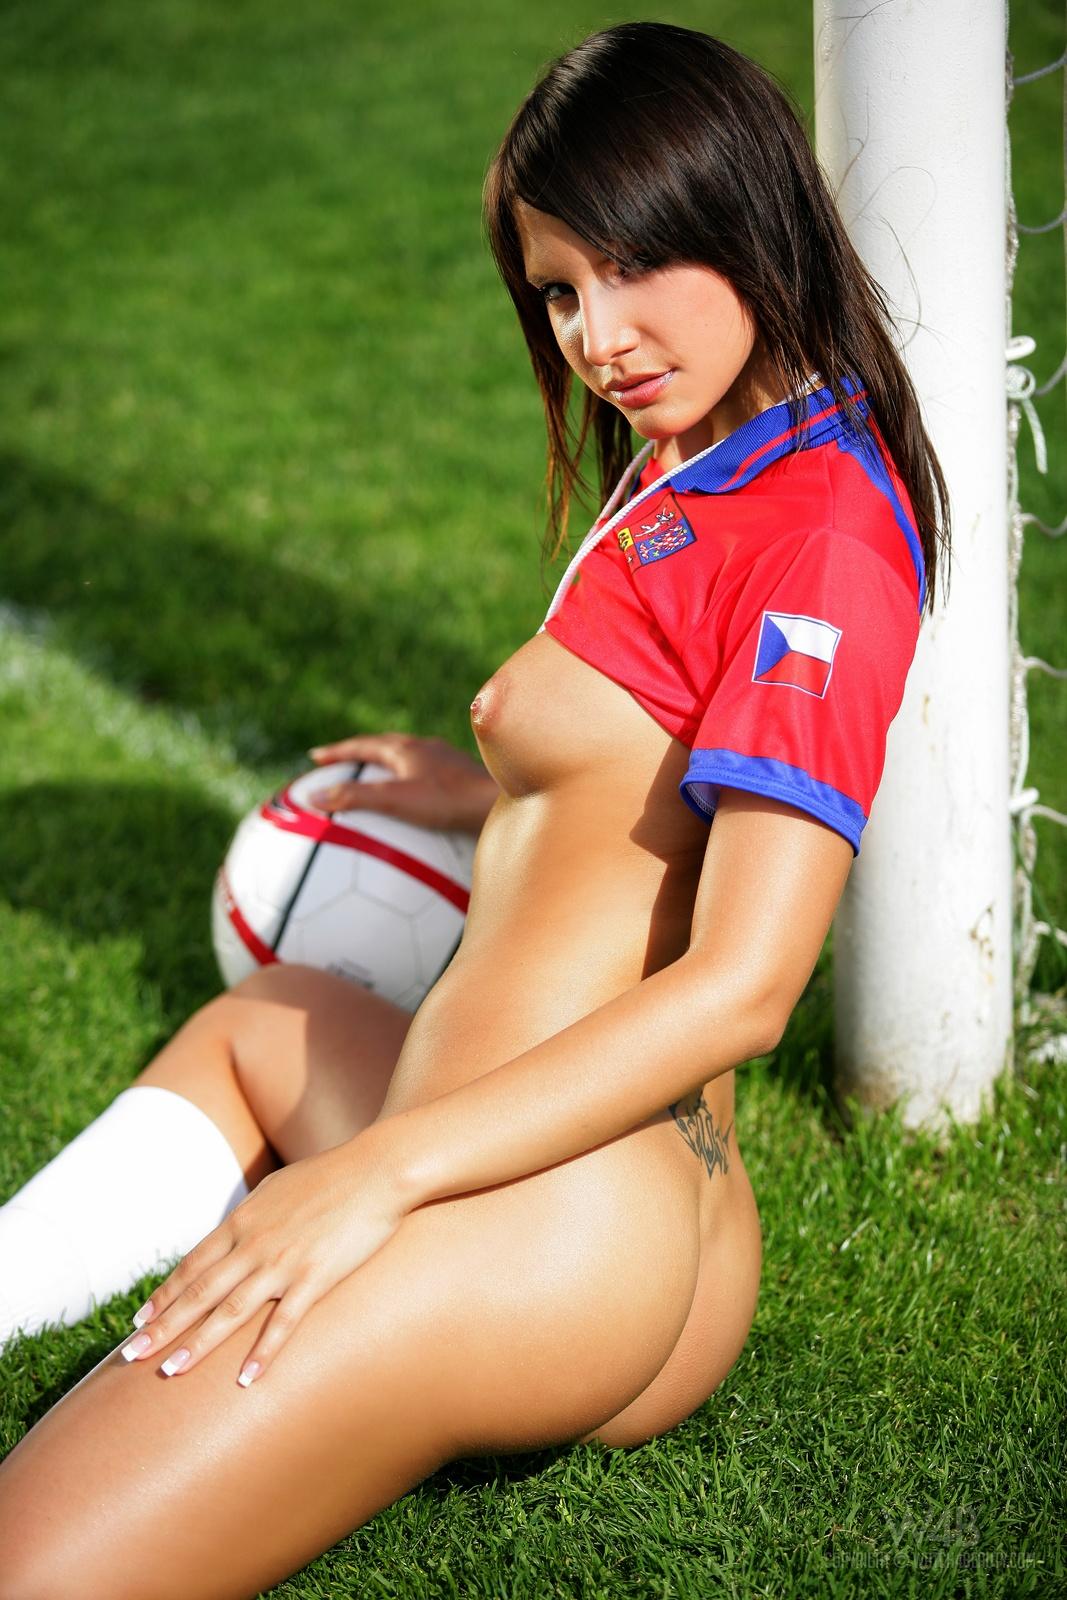 monika-vesela-nude-football-watch4beauty-15